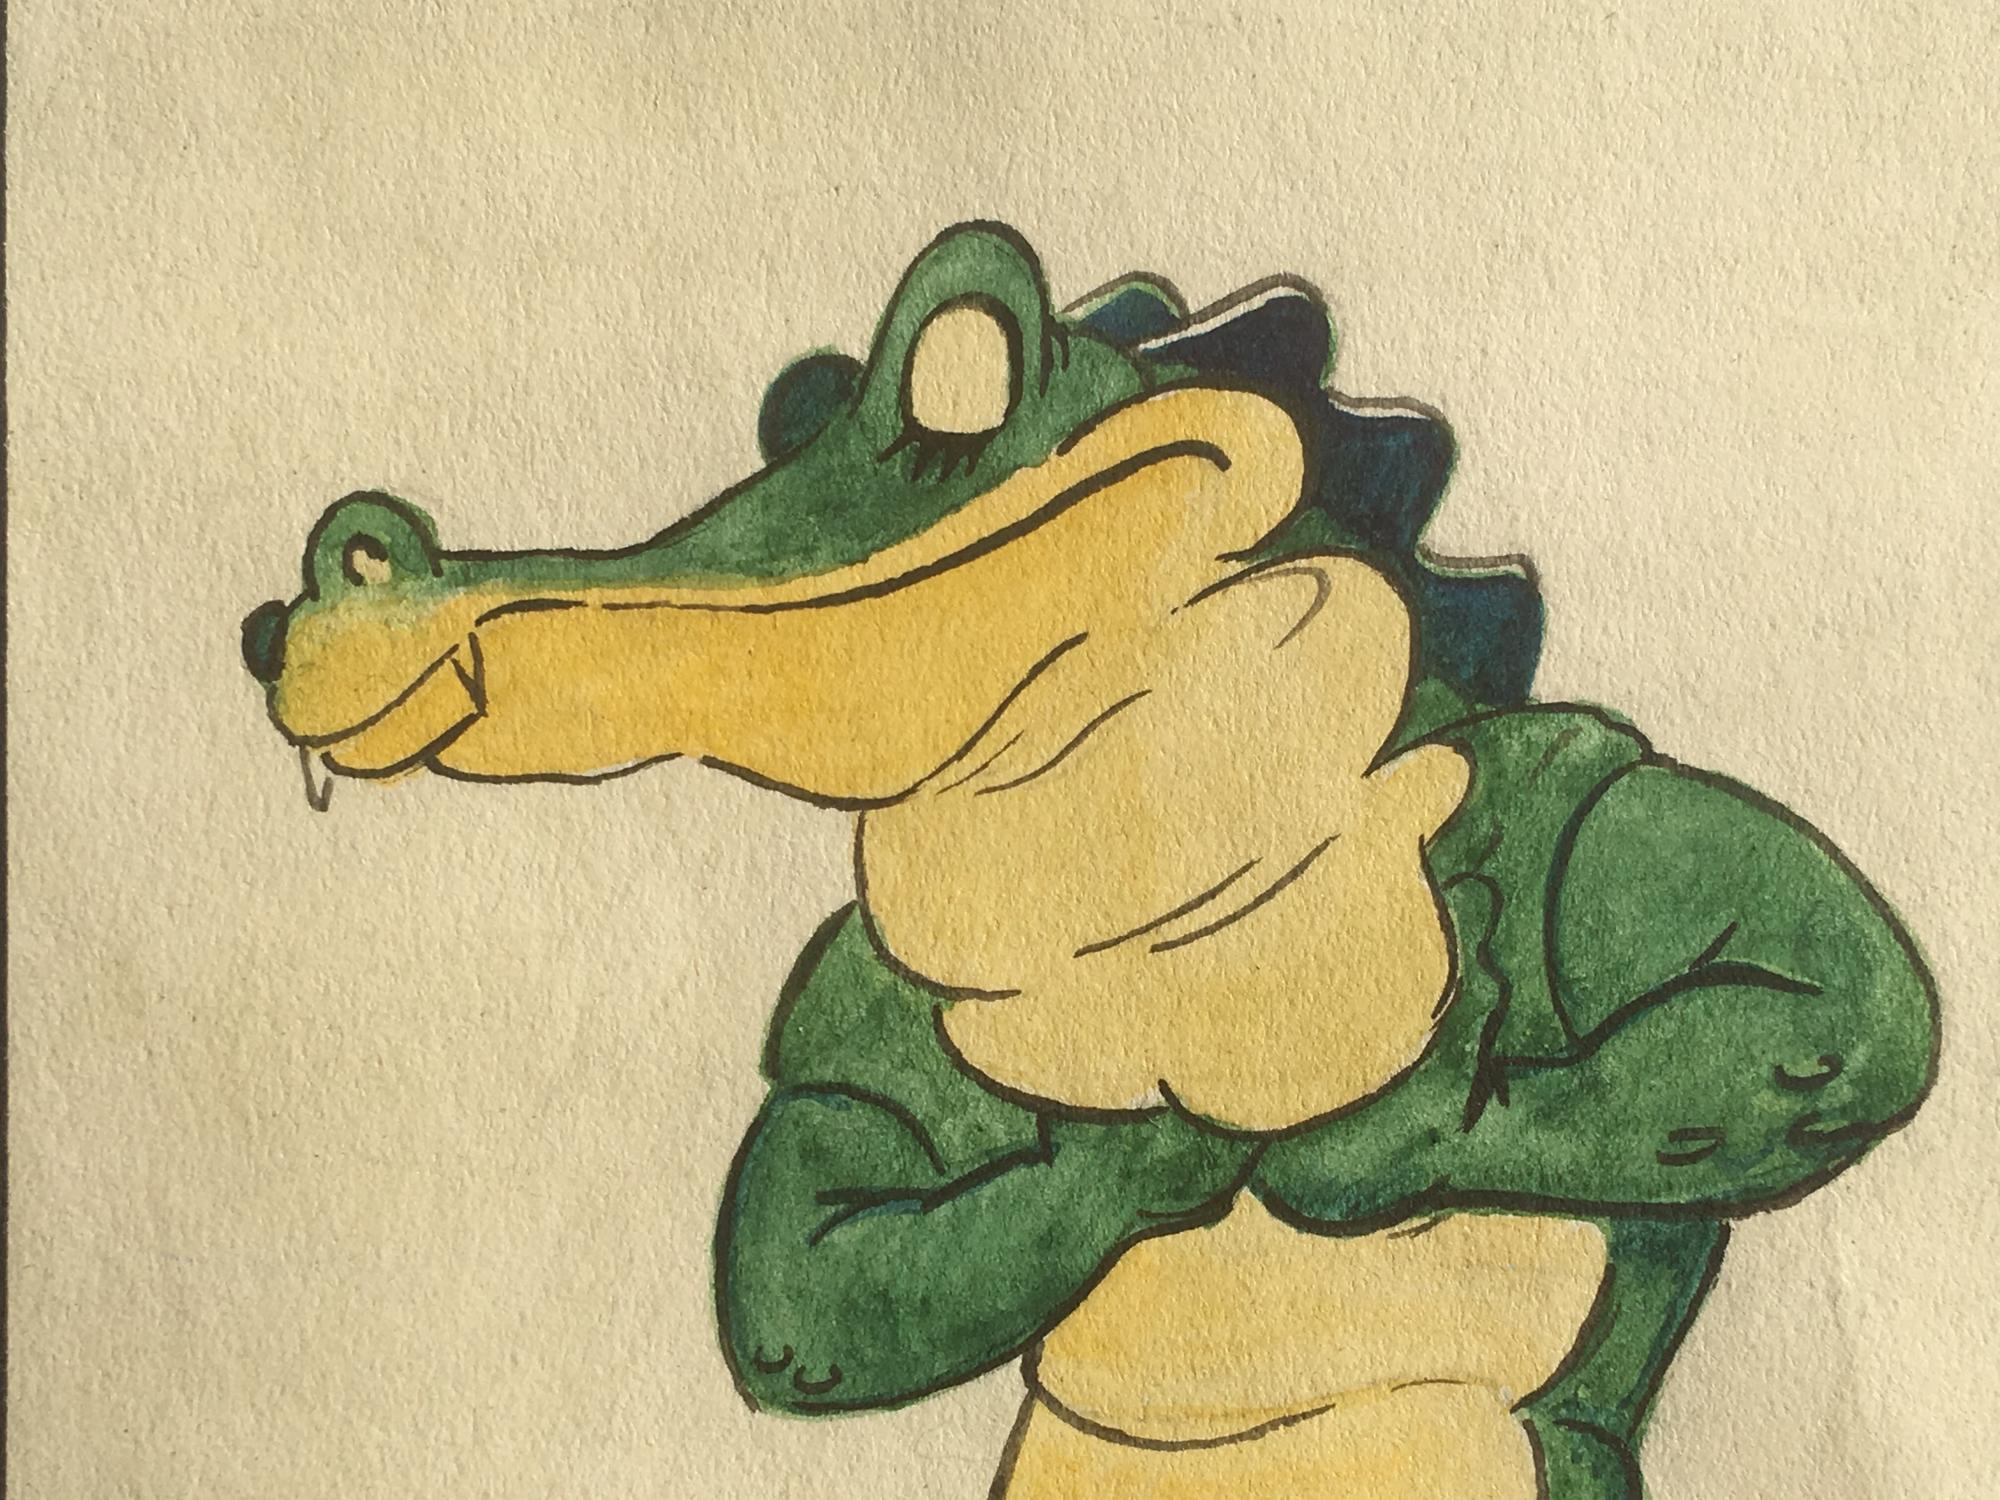 Disney Original Book Art Of Ben Ali Gator From Fantasia No Binding